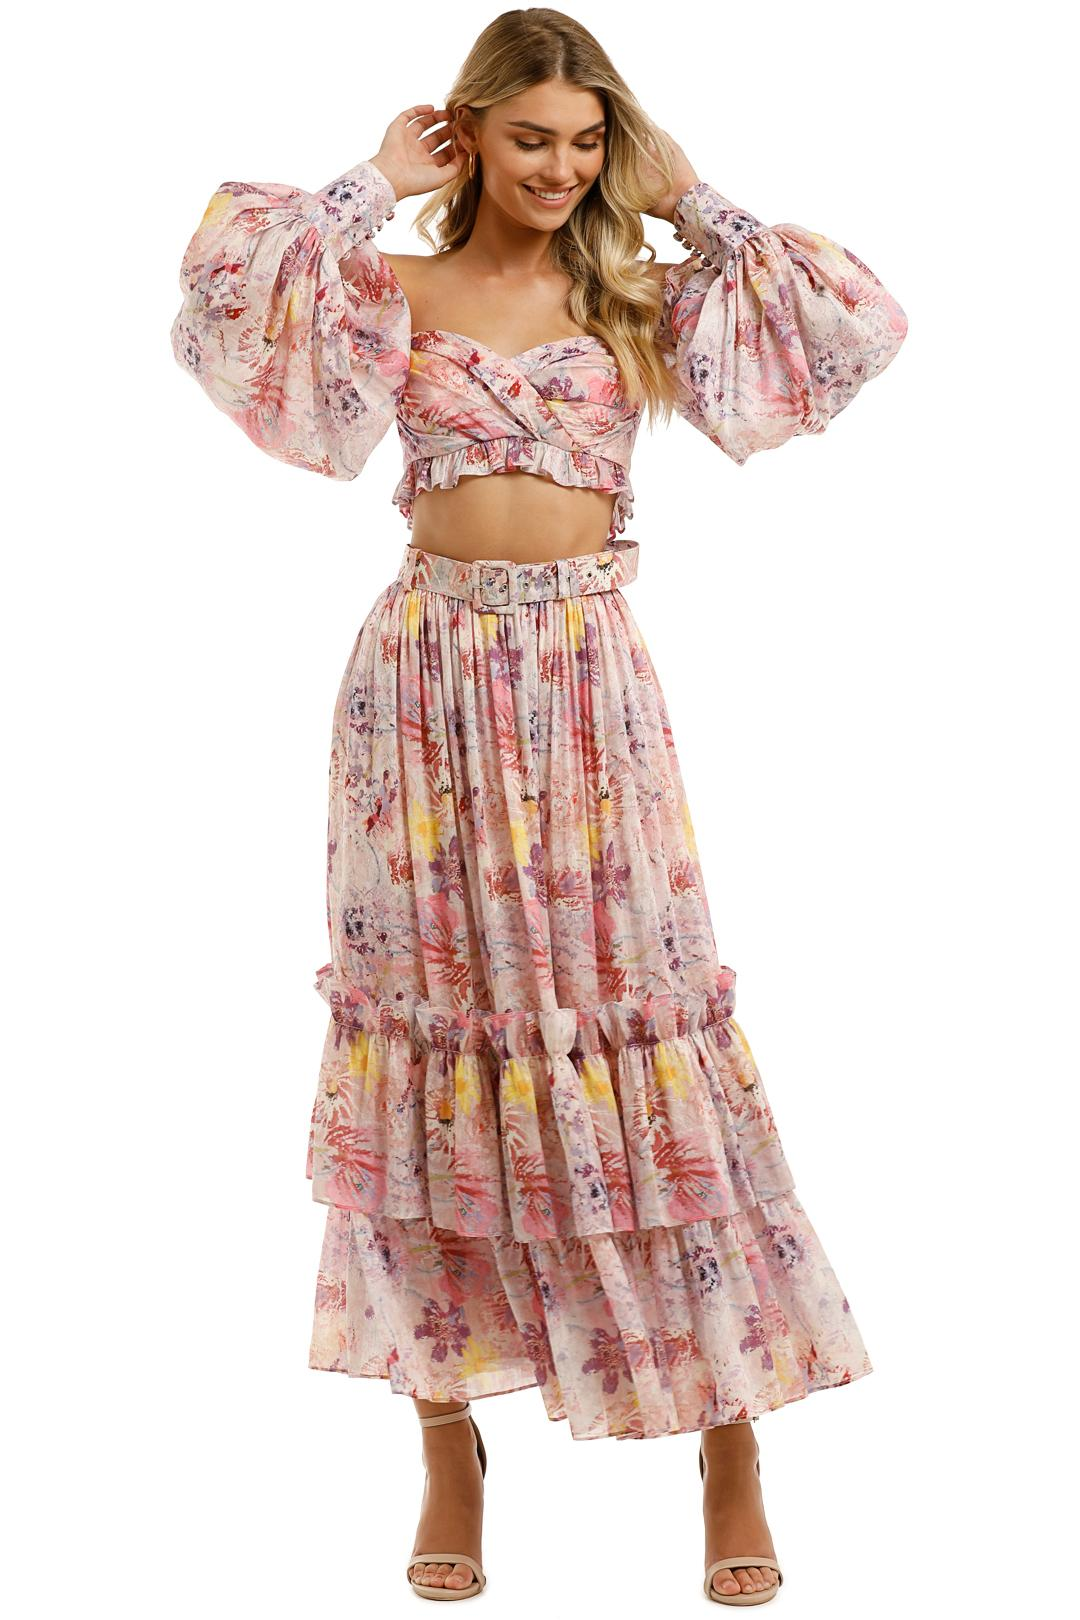 Leo and Lin - Euphoria Silk Linen Bralette and Skirt